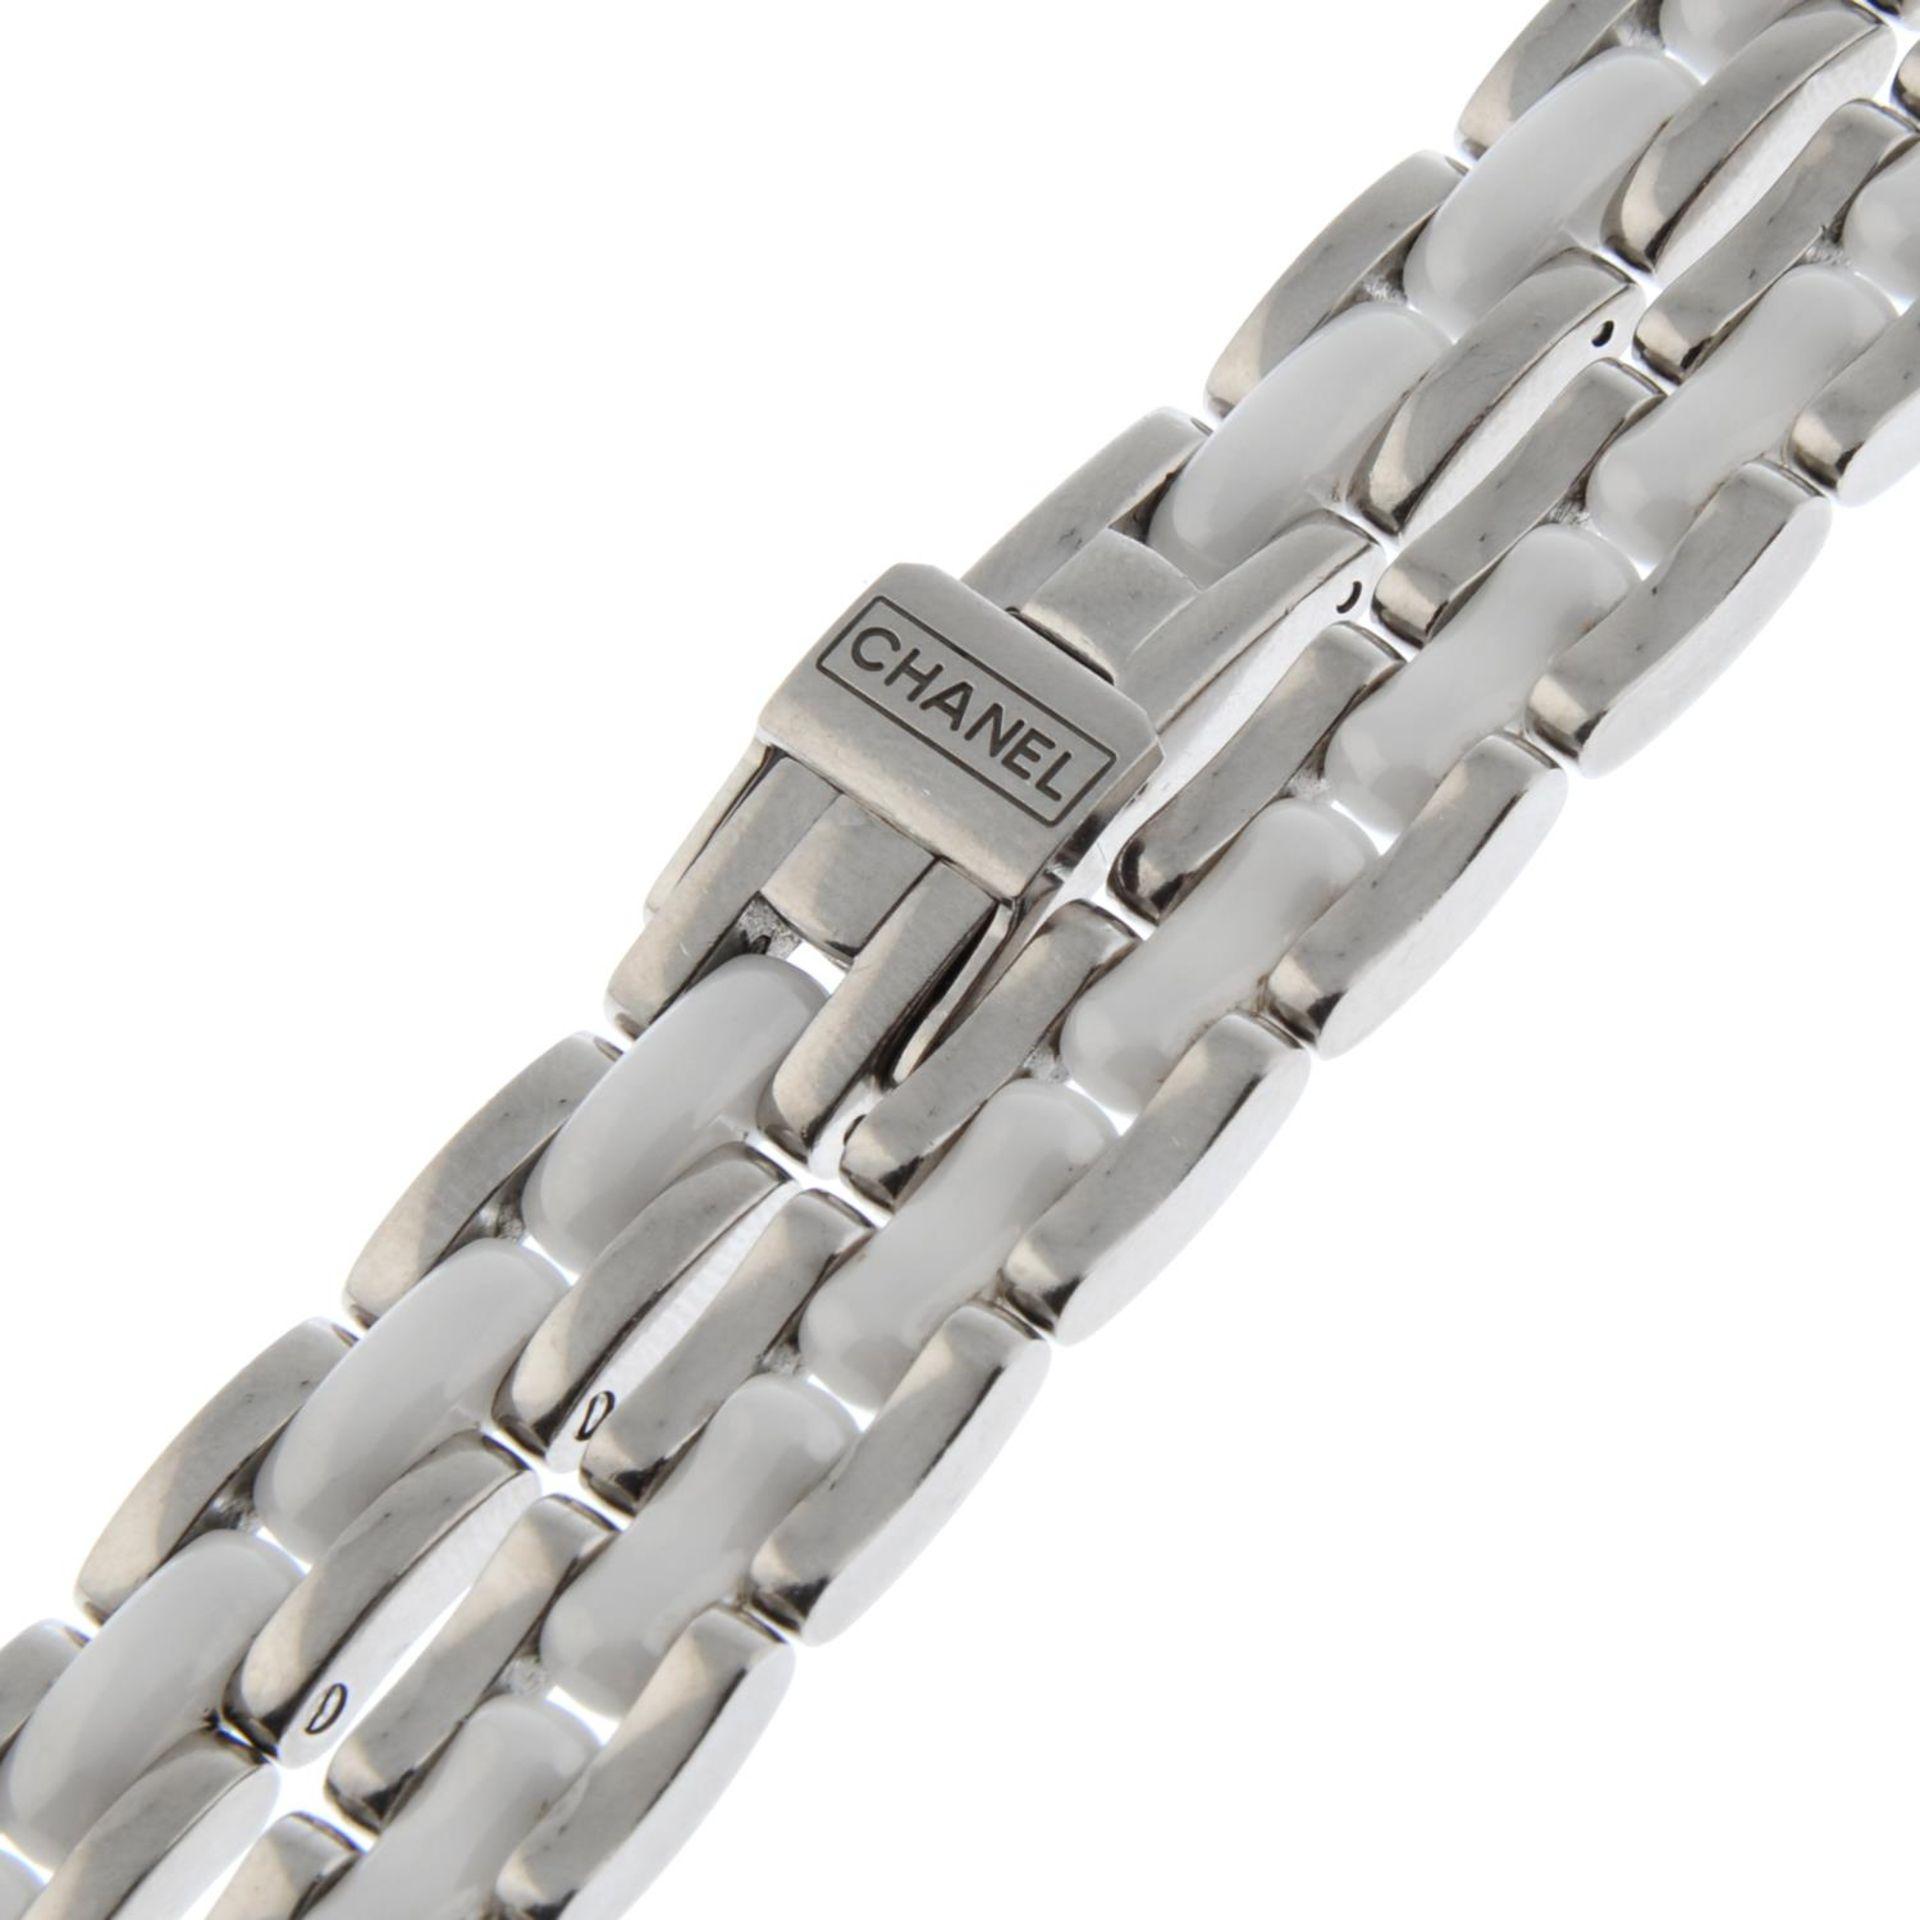 CHANEL - a Premiere bracelet watch. - Bild 4 aus 5